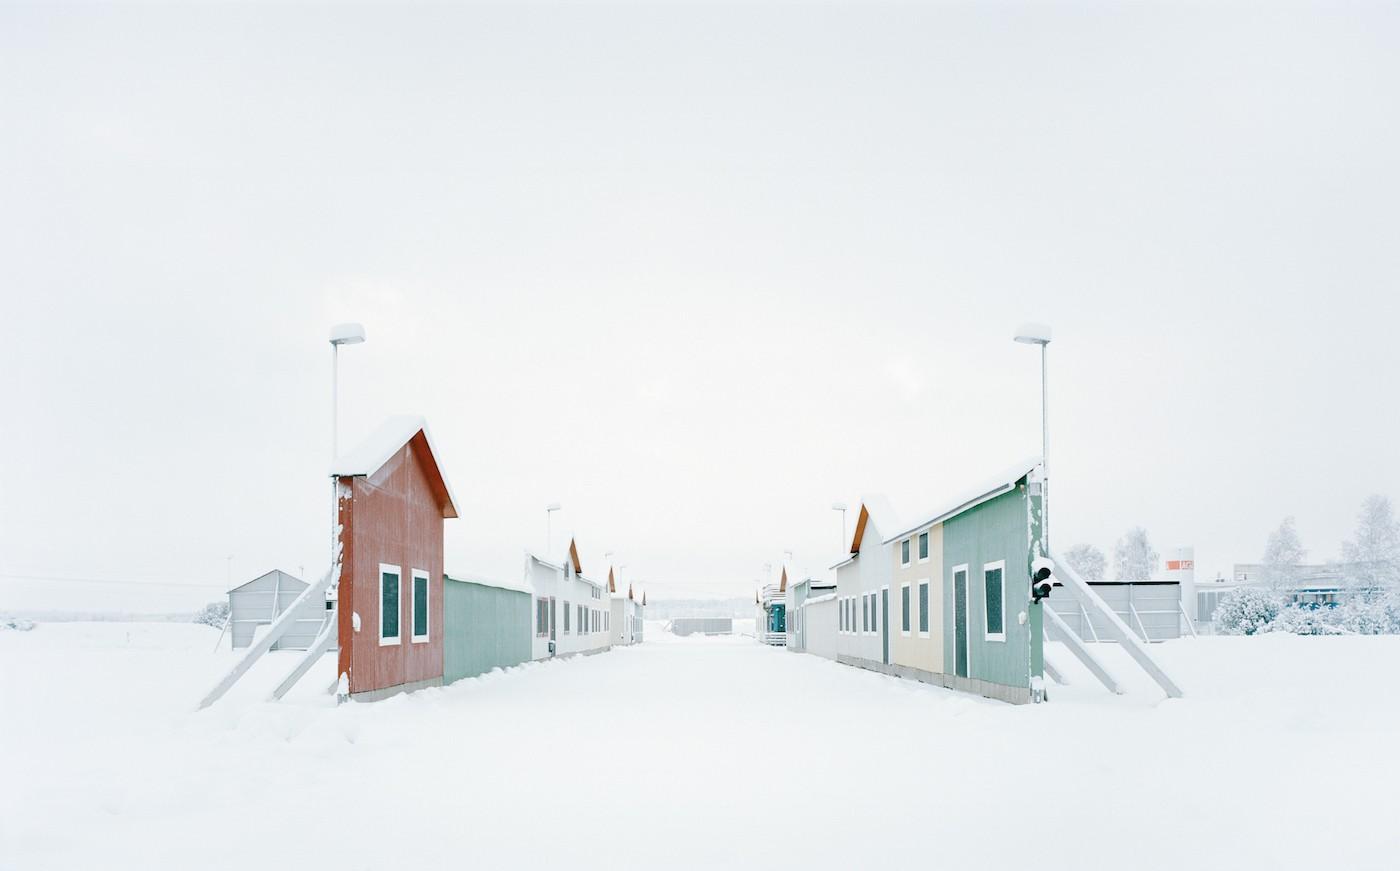 1_-sailer_carsoncity_sweden_6x9_rgb.jpg